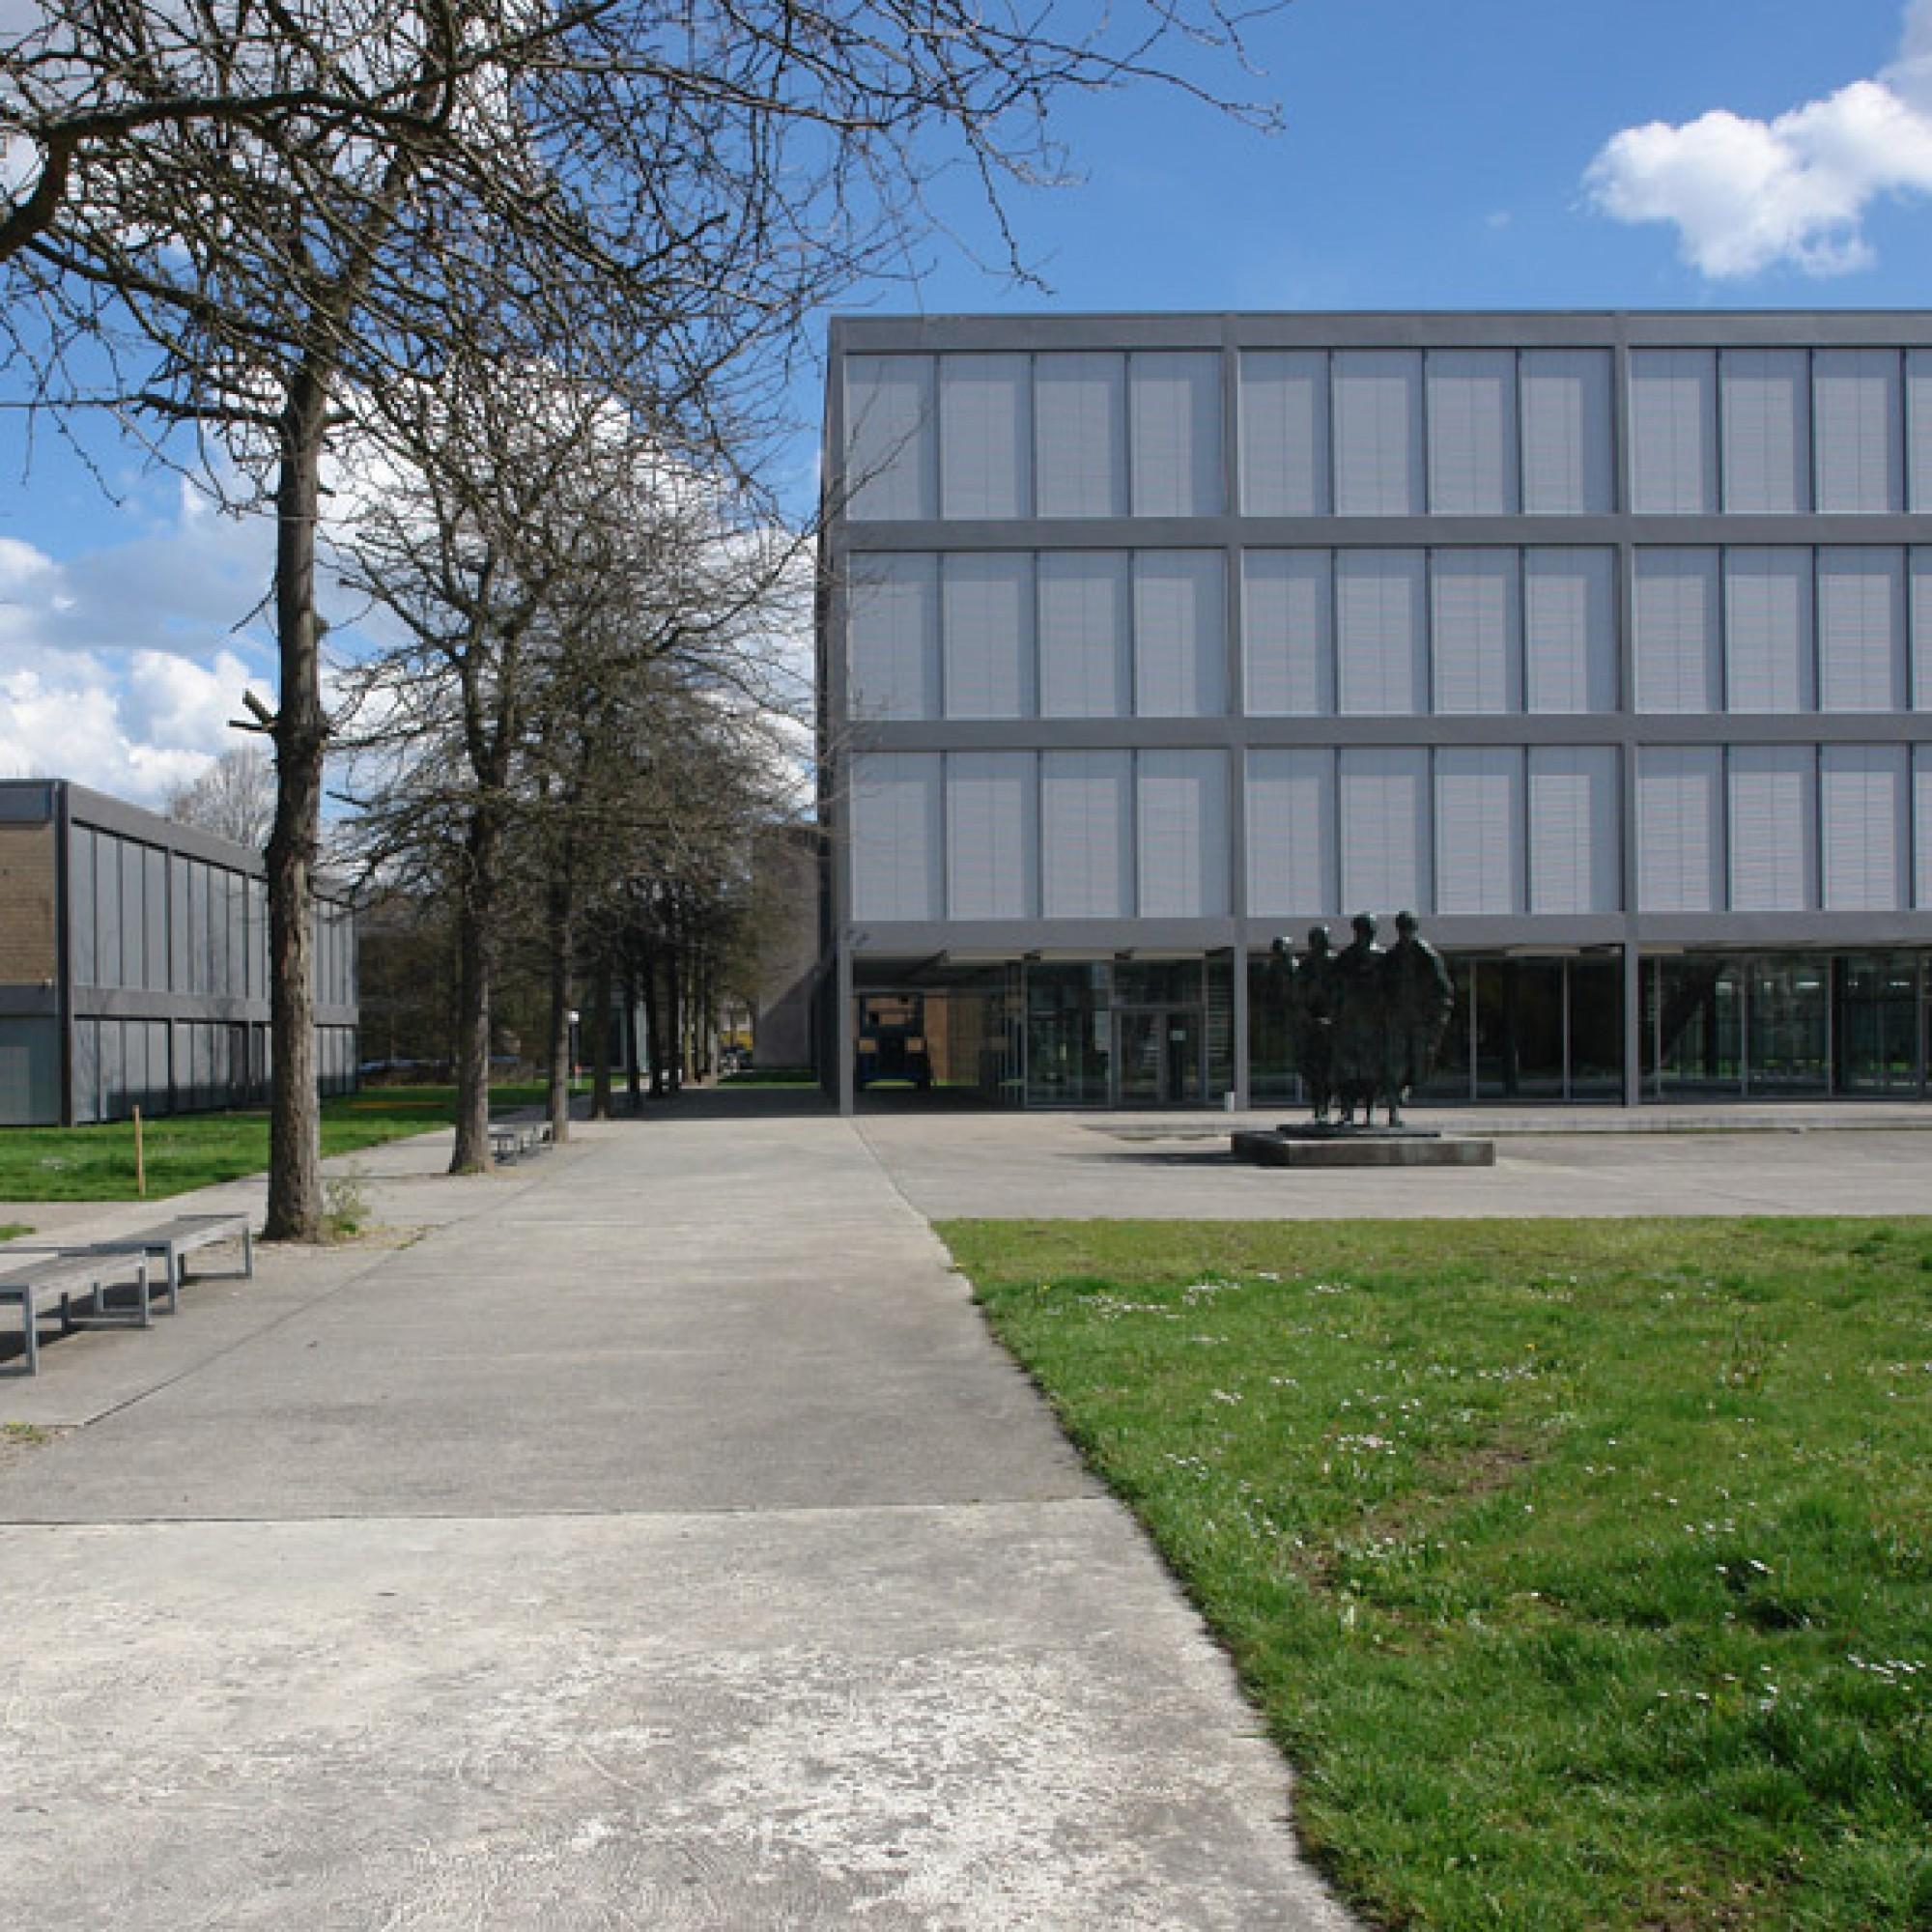 Aargauer Architekturjuwel:  Fritz Hallers Gymnasium in Baden. (Port(u*o)s, wikimedia, CC)